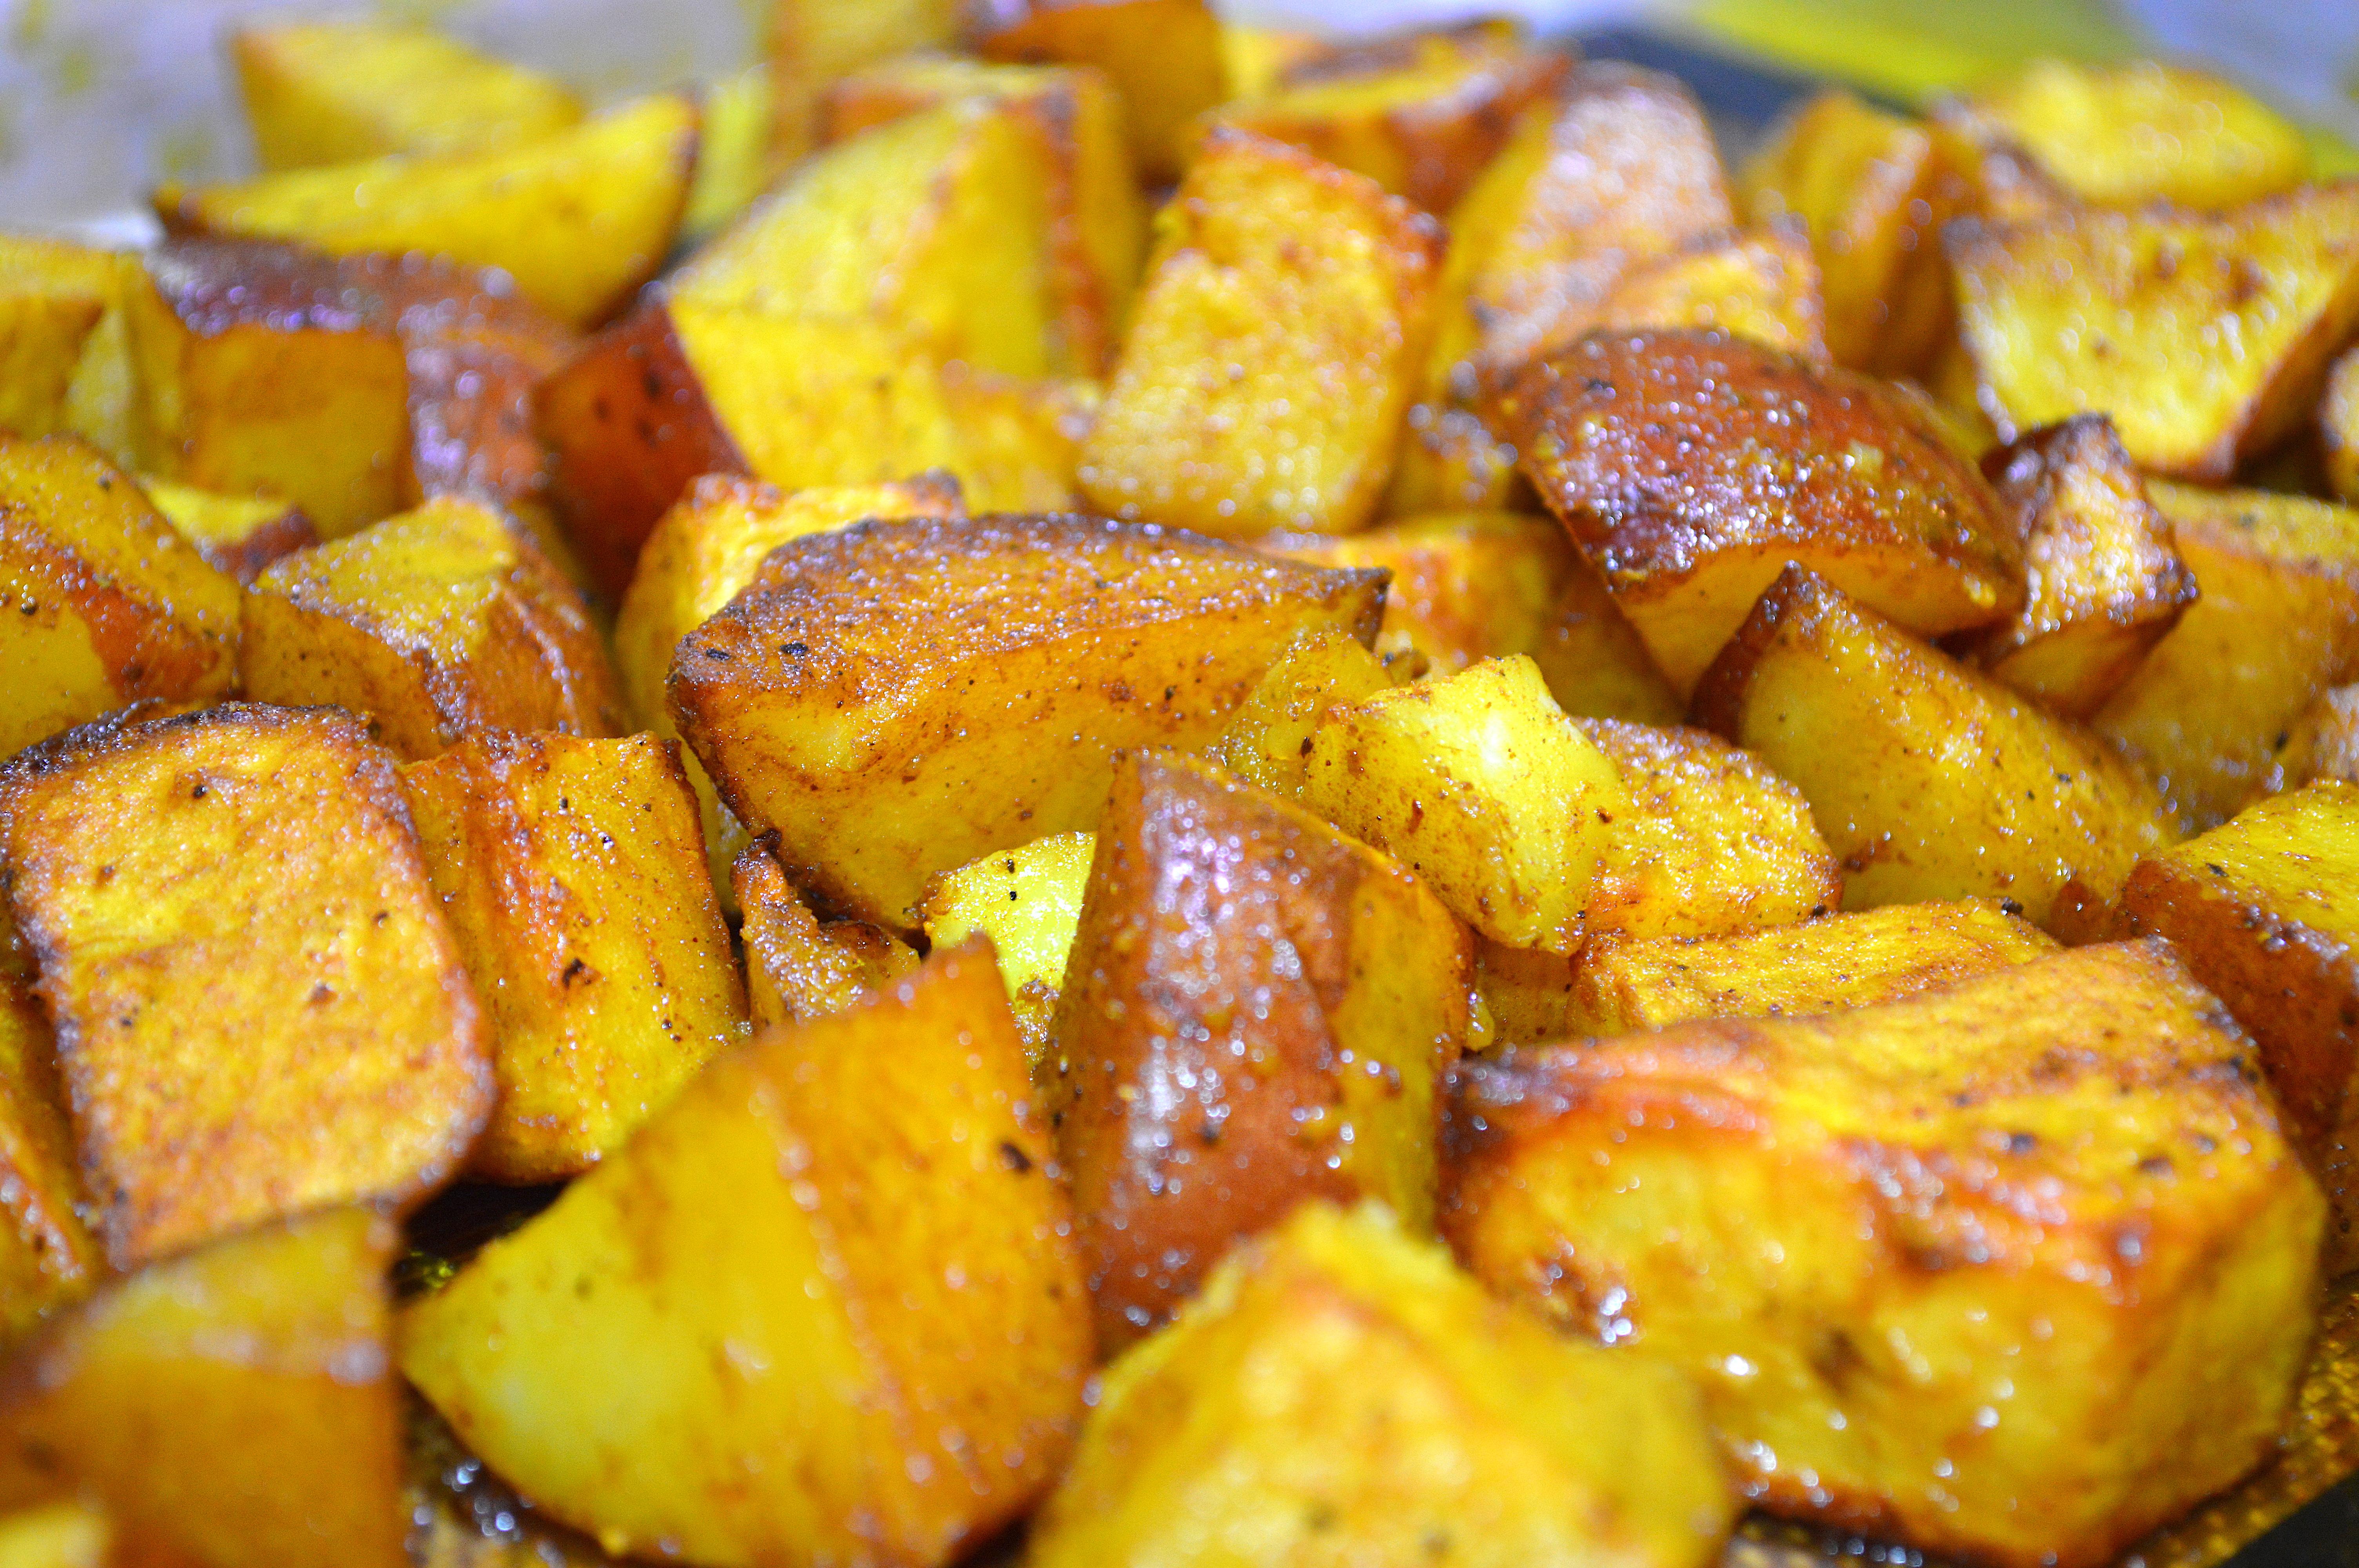 Roasted Turmeric Potatoes